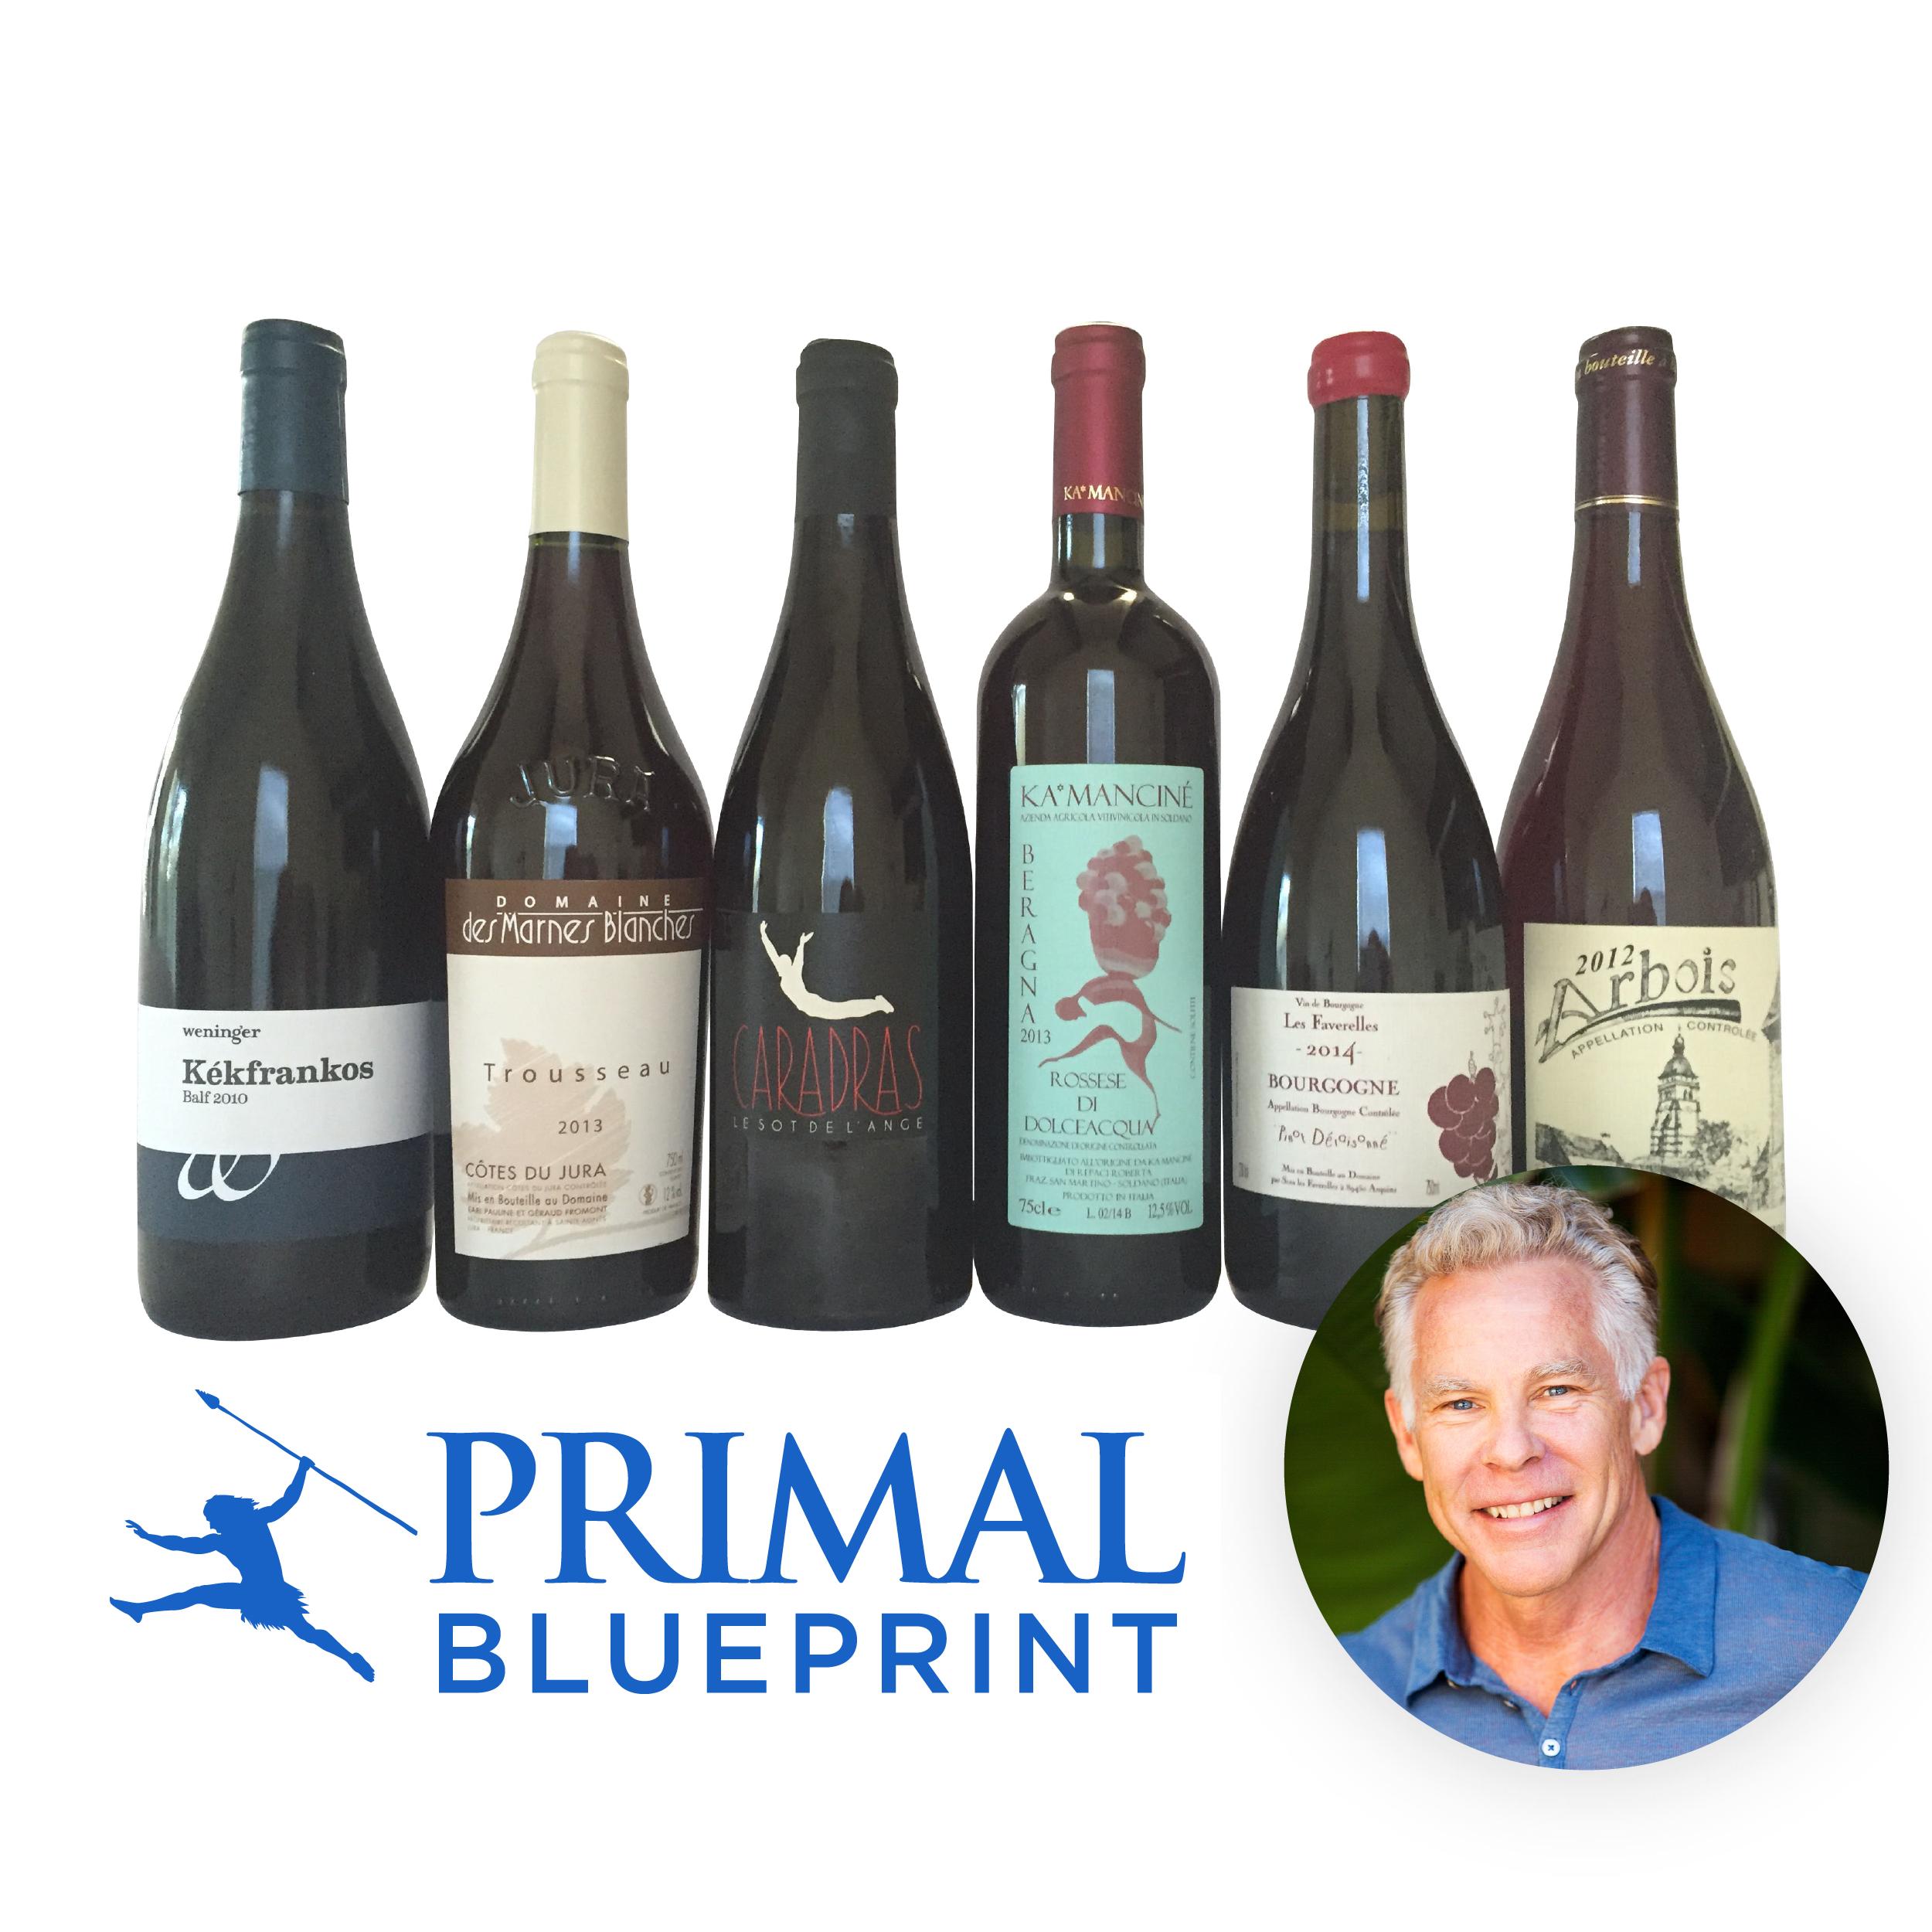 The perfect paleo wine mark sisson primal blueprint health food mark sisson primal blueprint malvernweather Choice Image